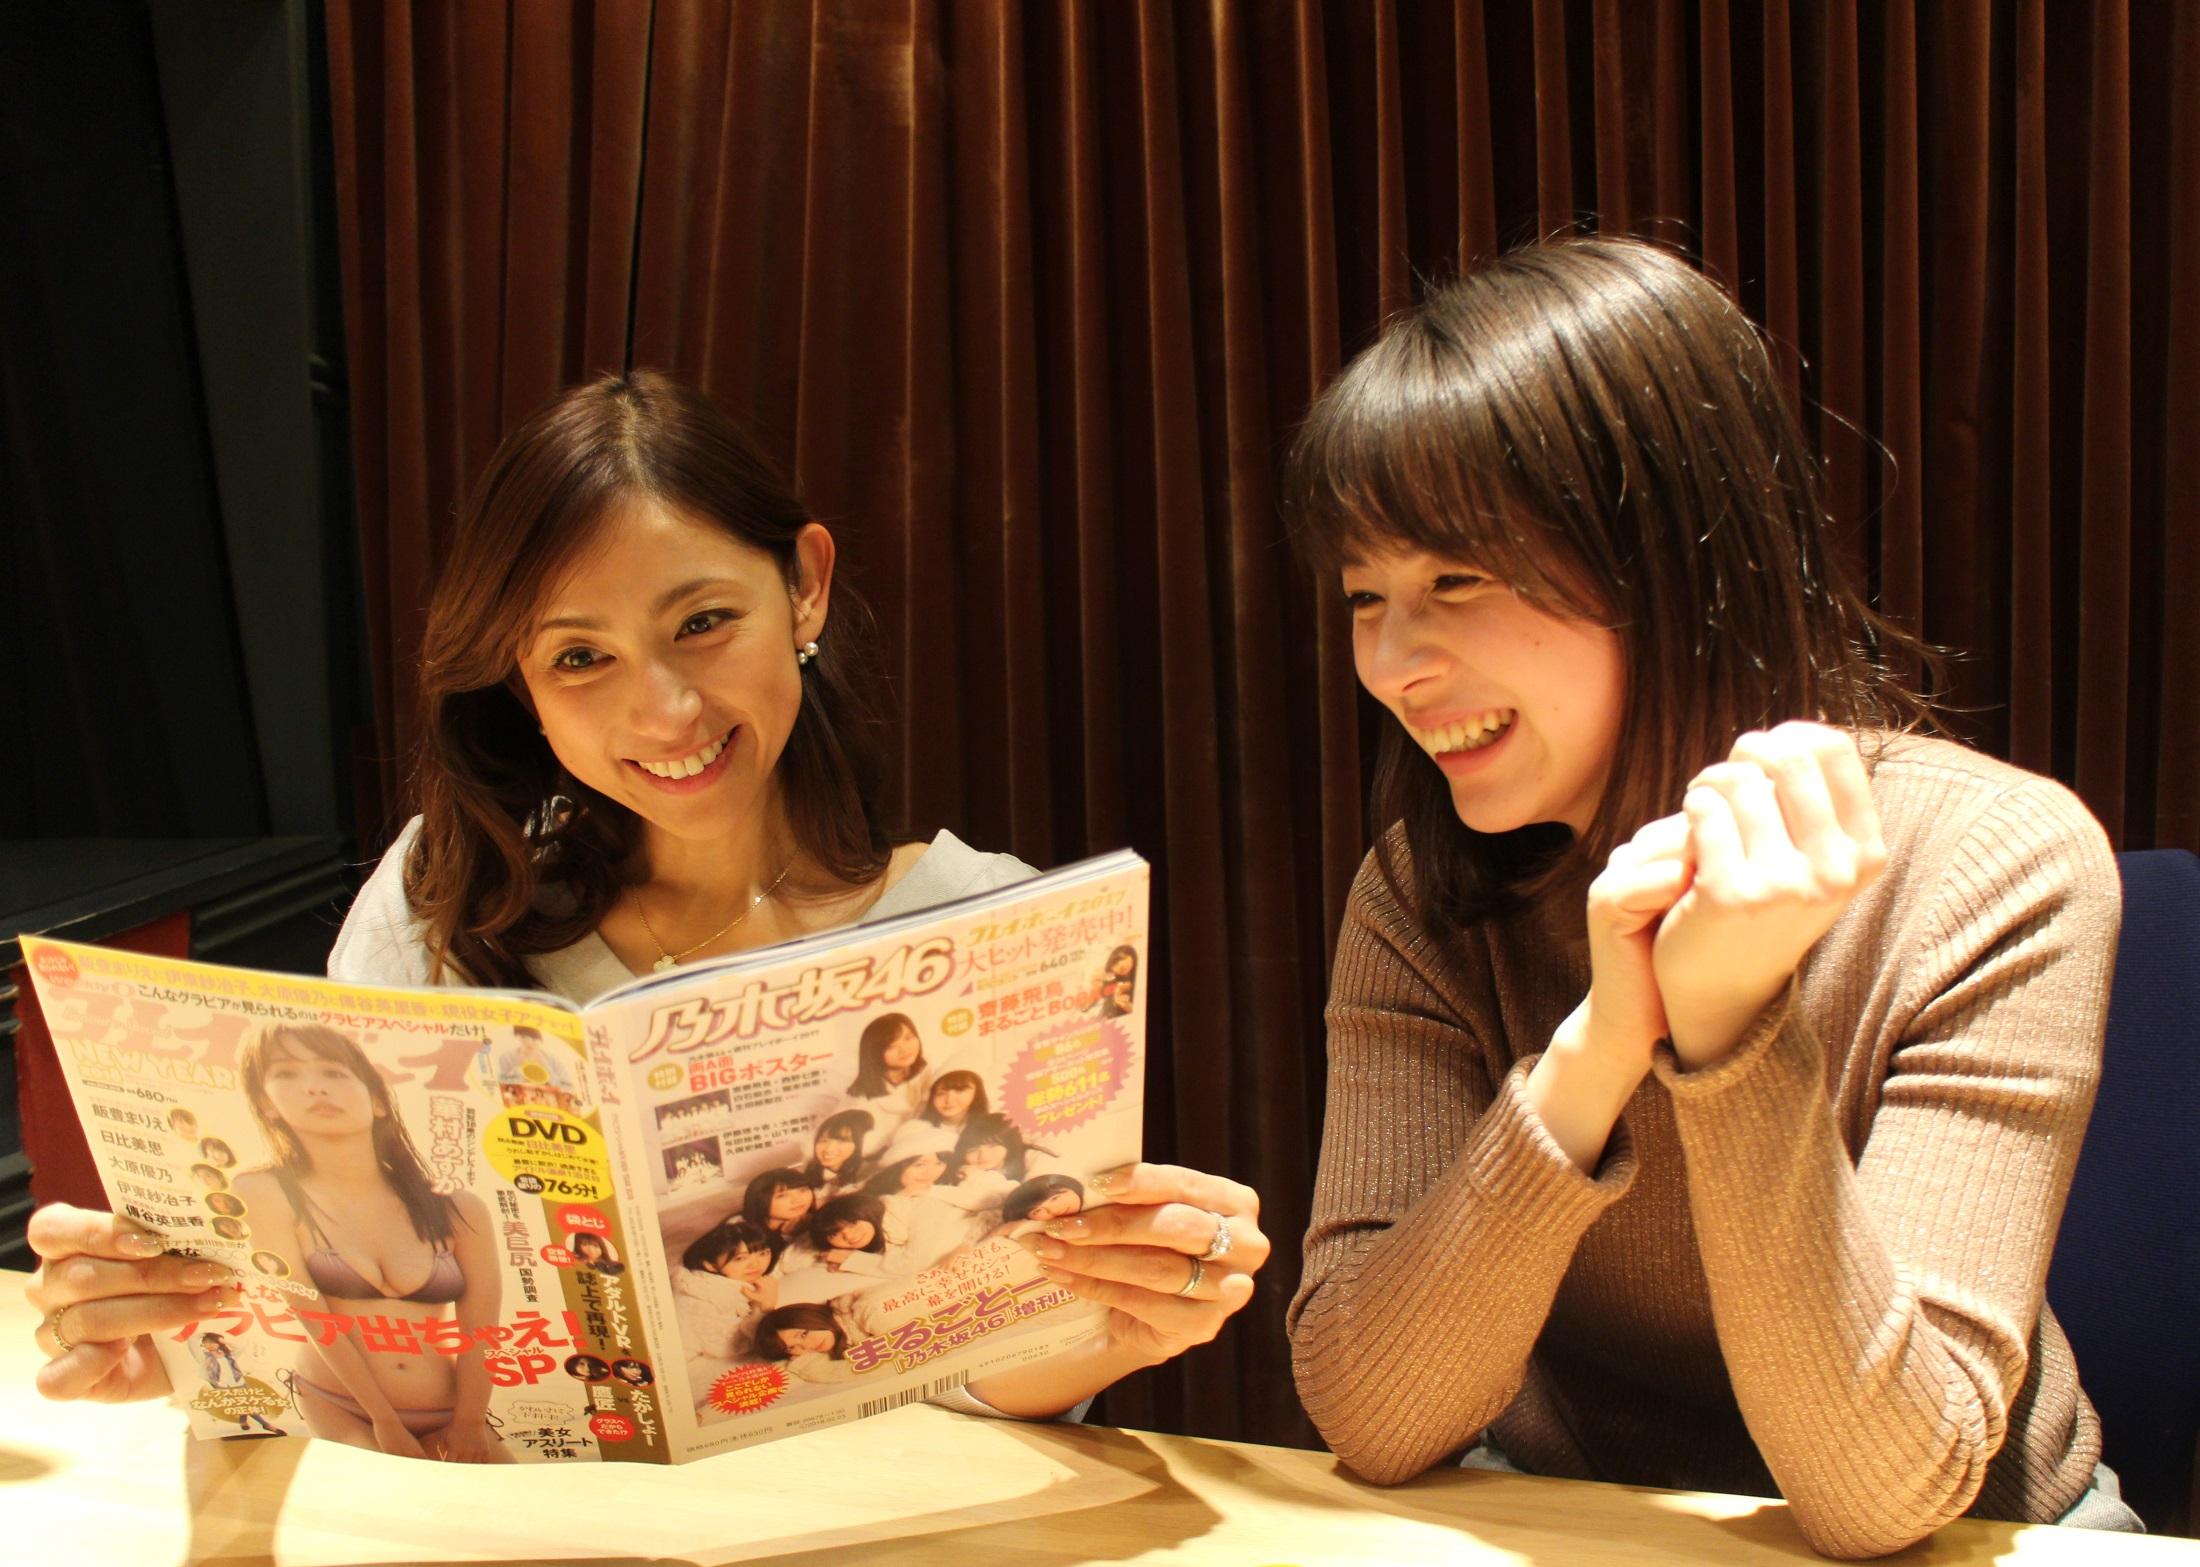 TBS★皆川玲奈 Vol.8★NEWS23 ドライバーズ・リクエスト©2ch.netYouTube動画>2本 ->画像>777枚